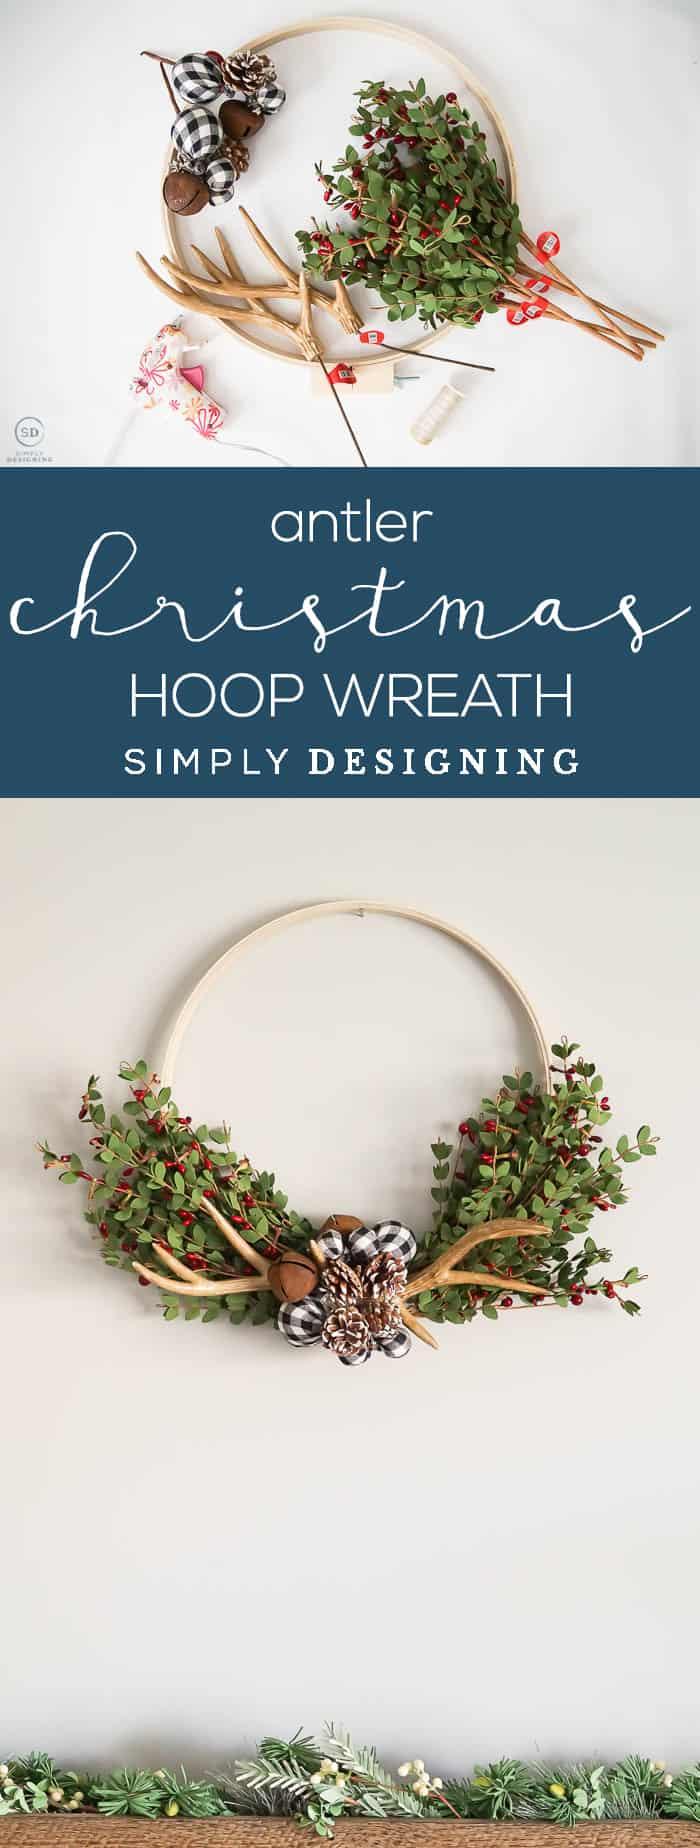 Antler Christmas Hoop Wreath - a really easy and beautiful farmhouse hoop wreath for the holidays